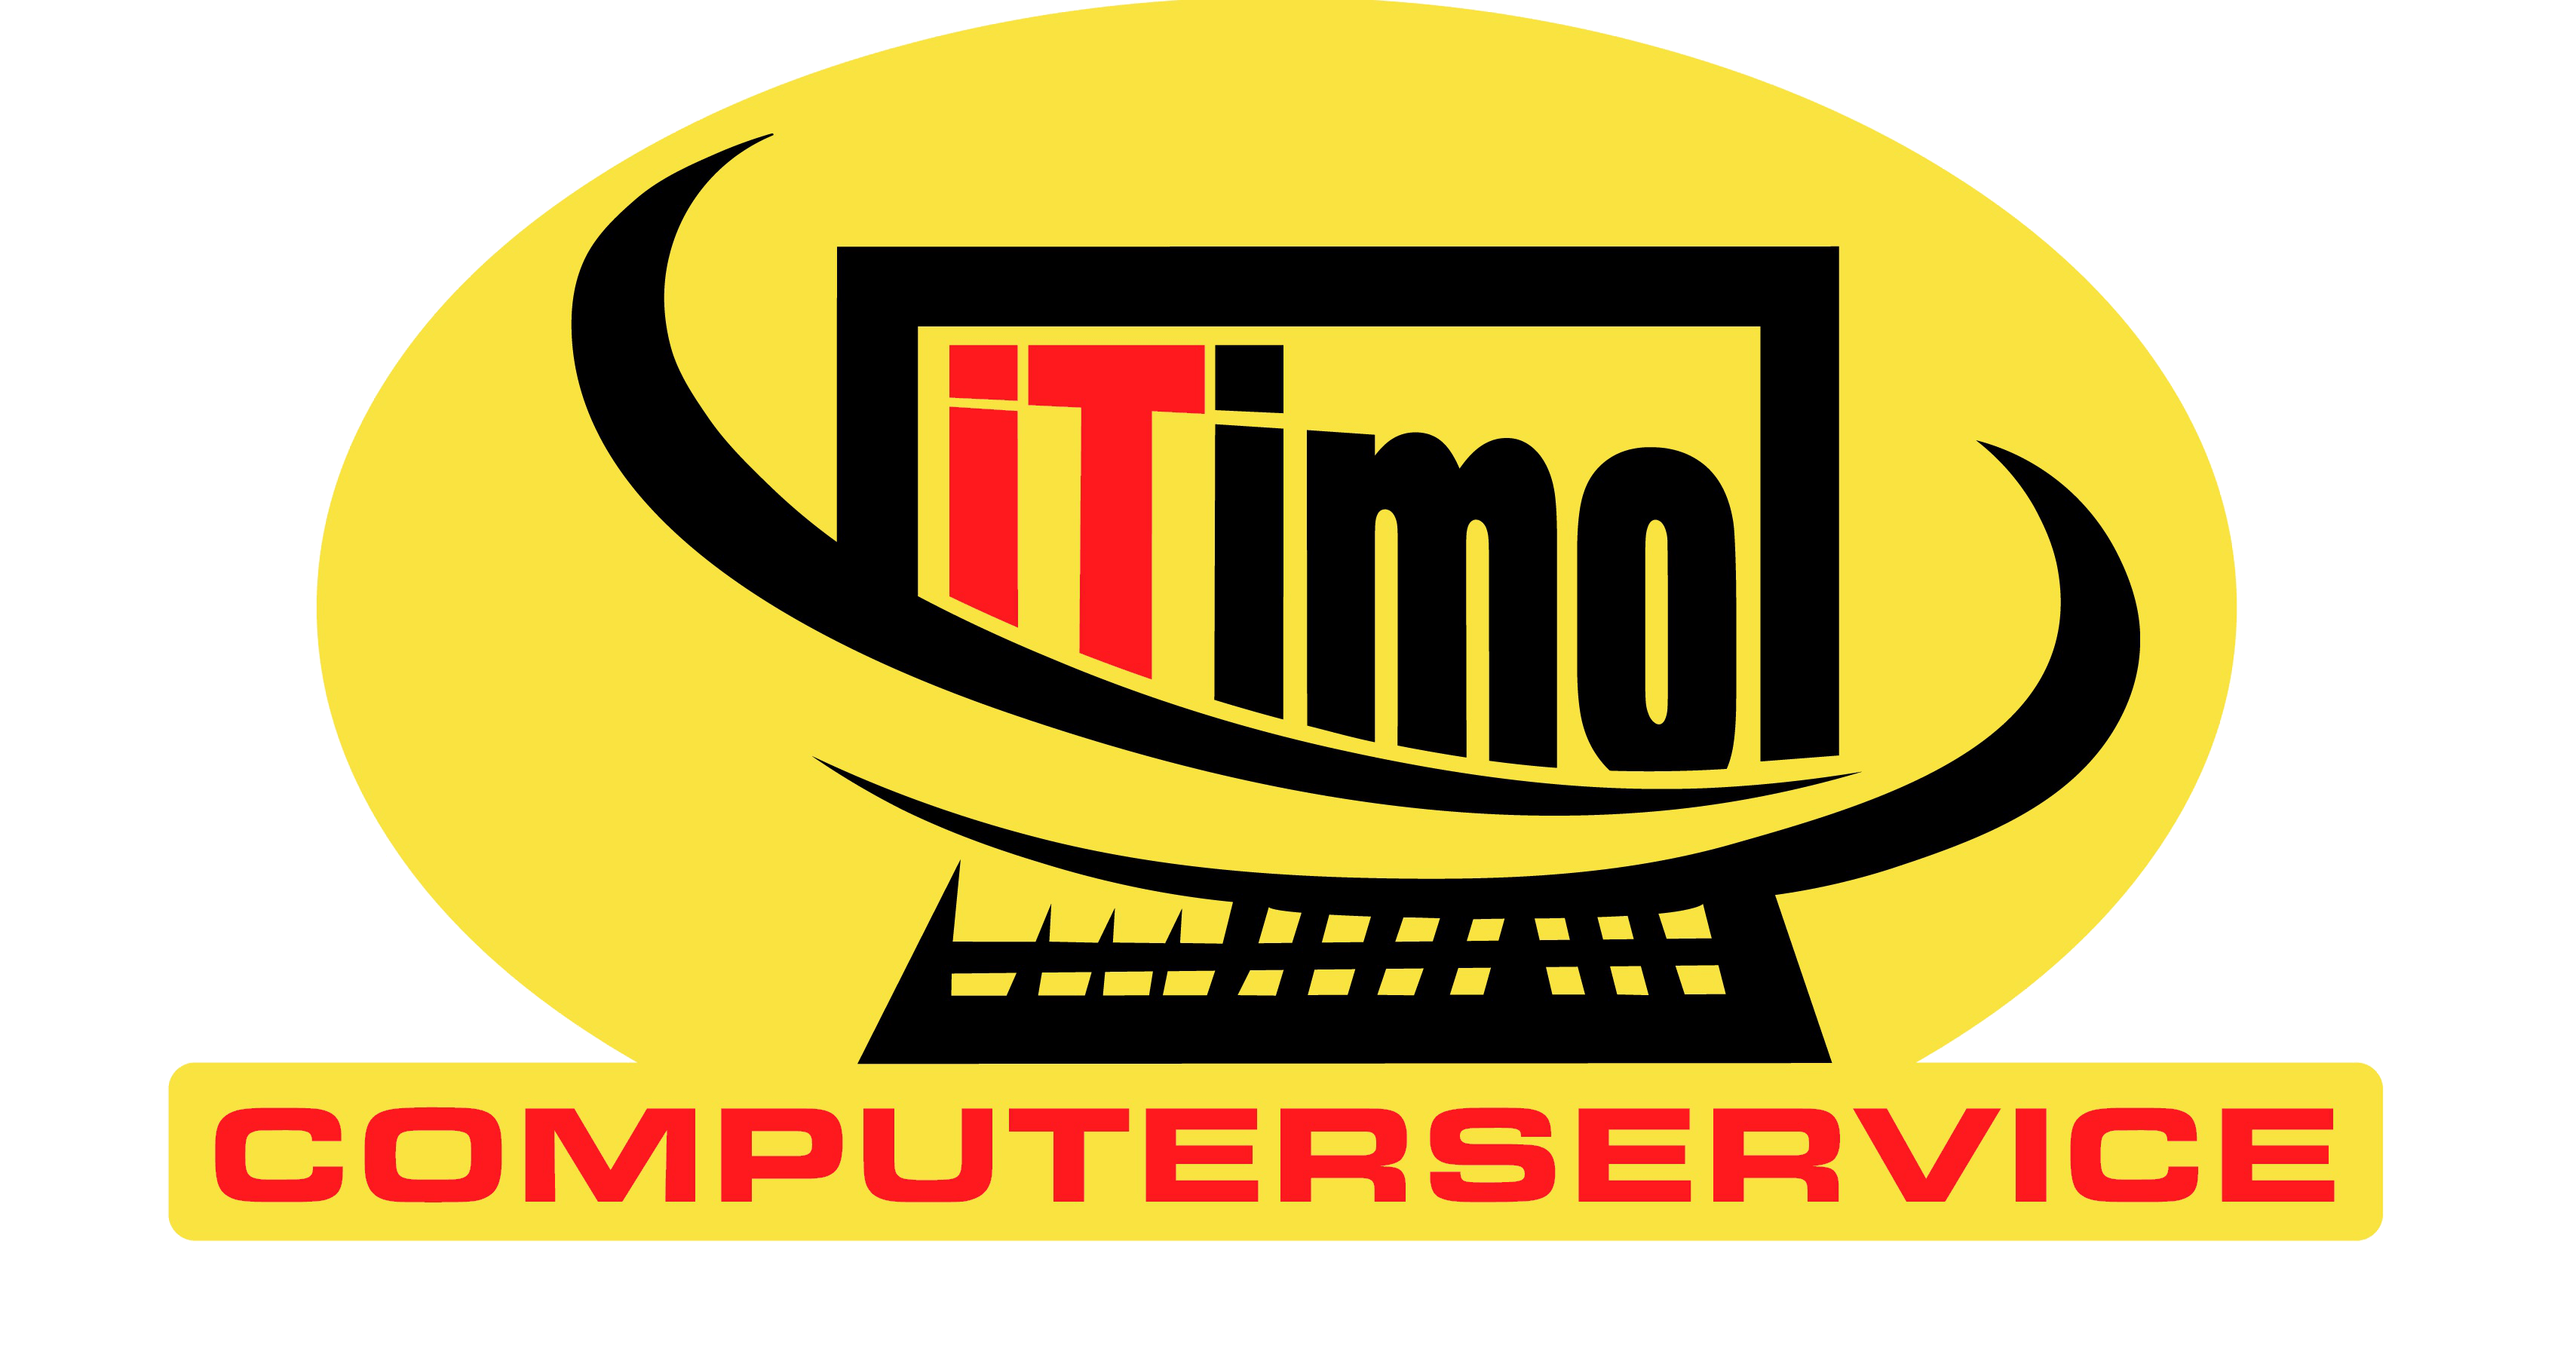 iTimo Computer Service